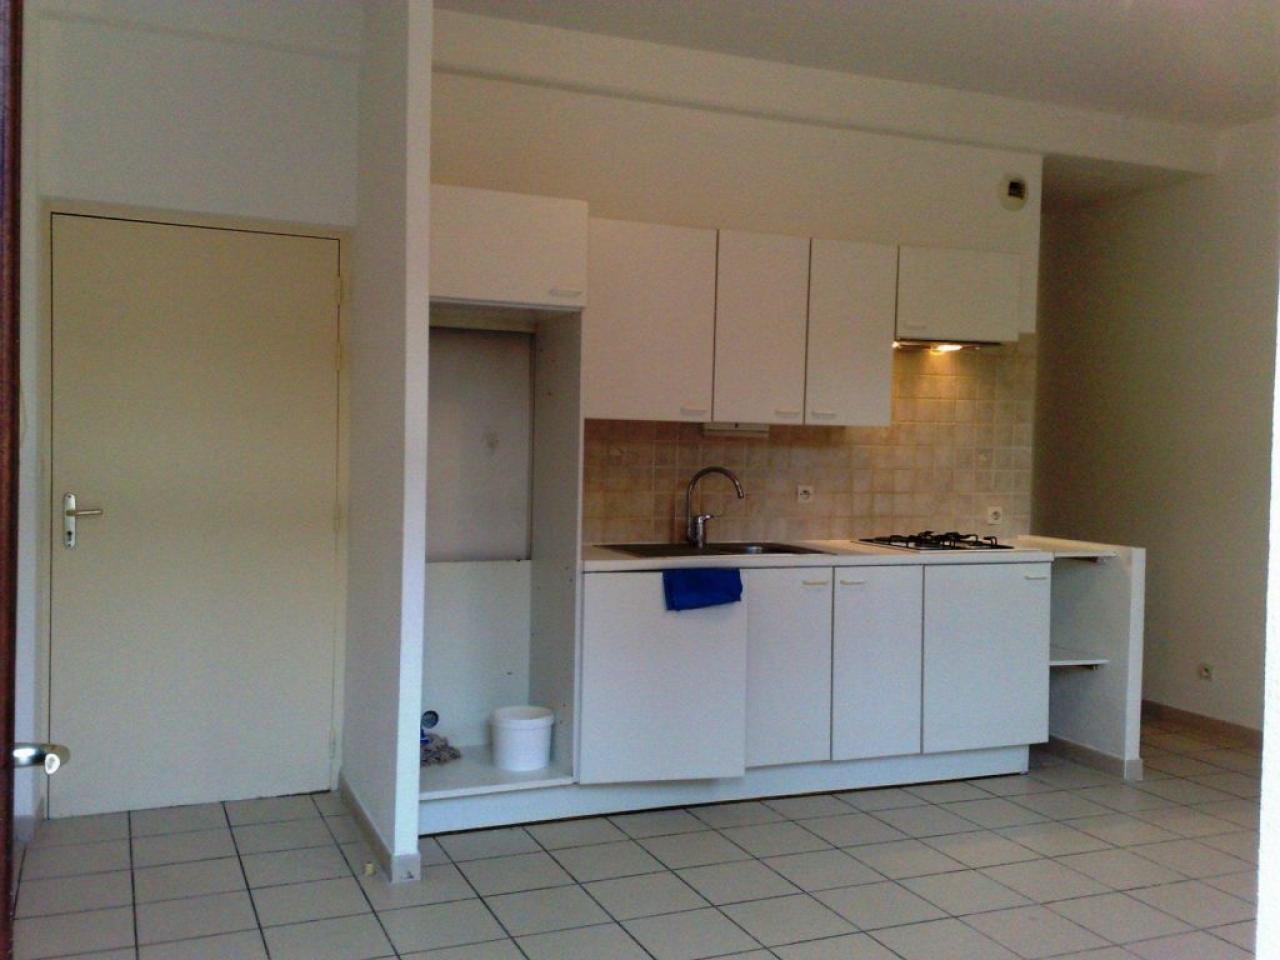 Apartment CARCASSONNE | 415 € / month